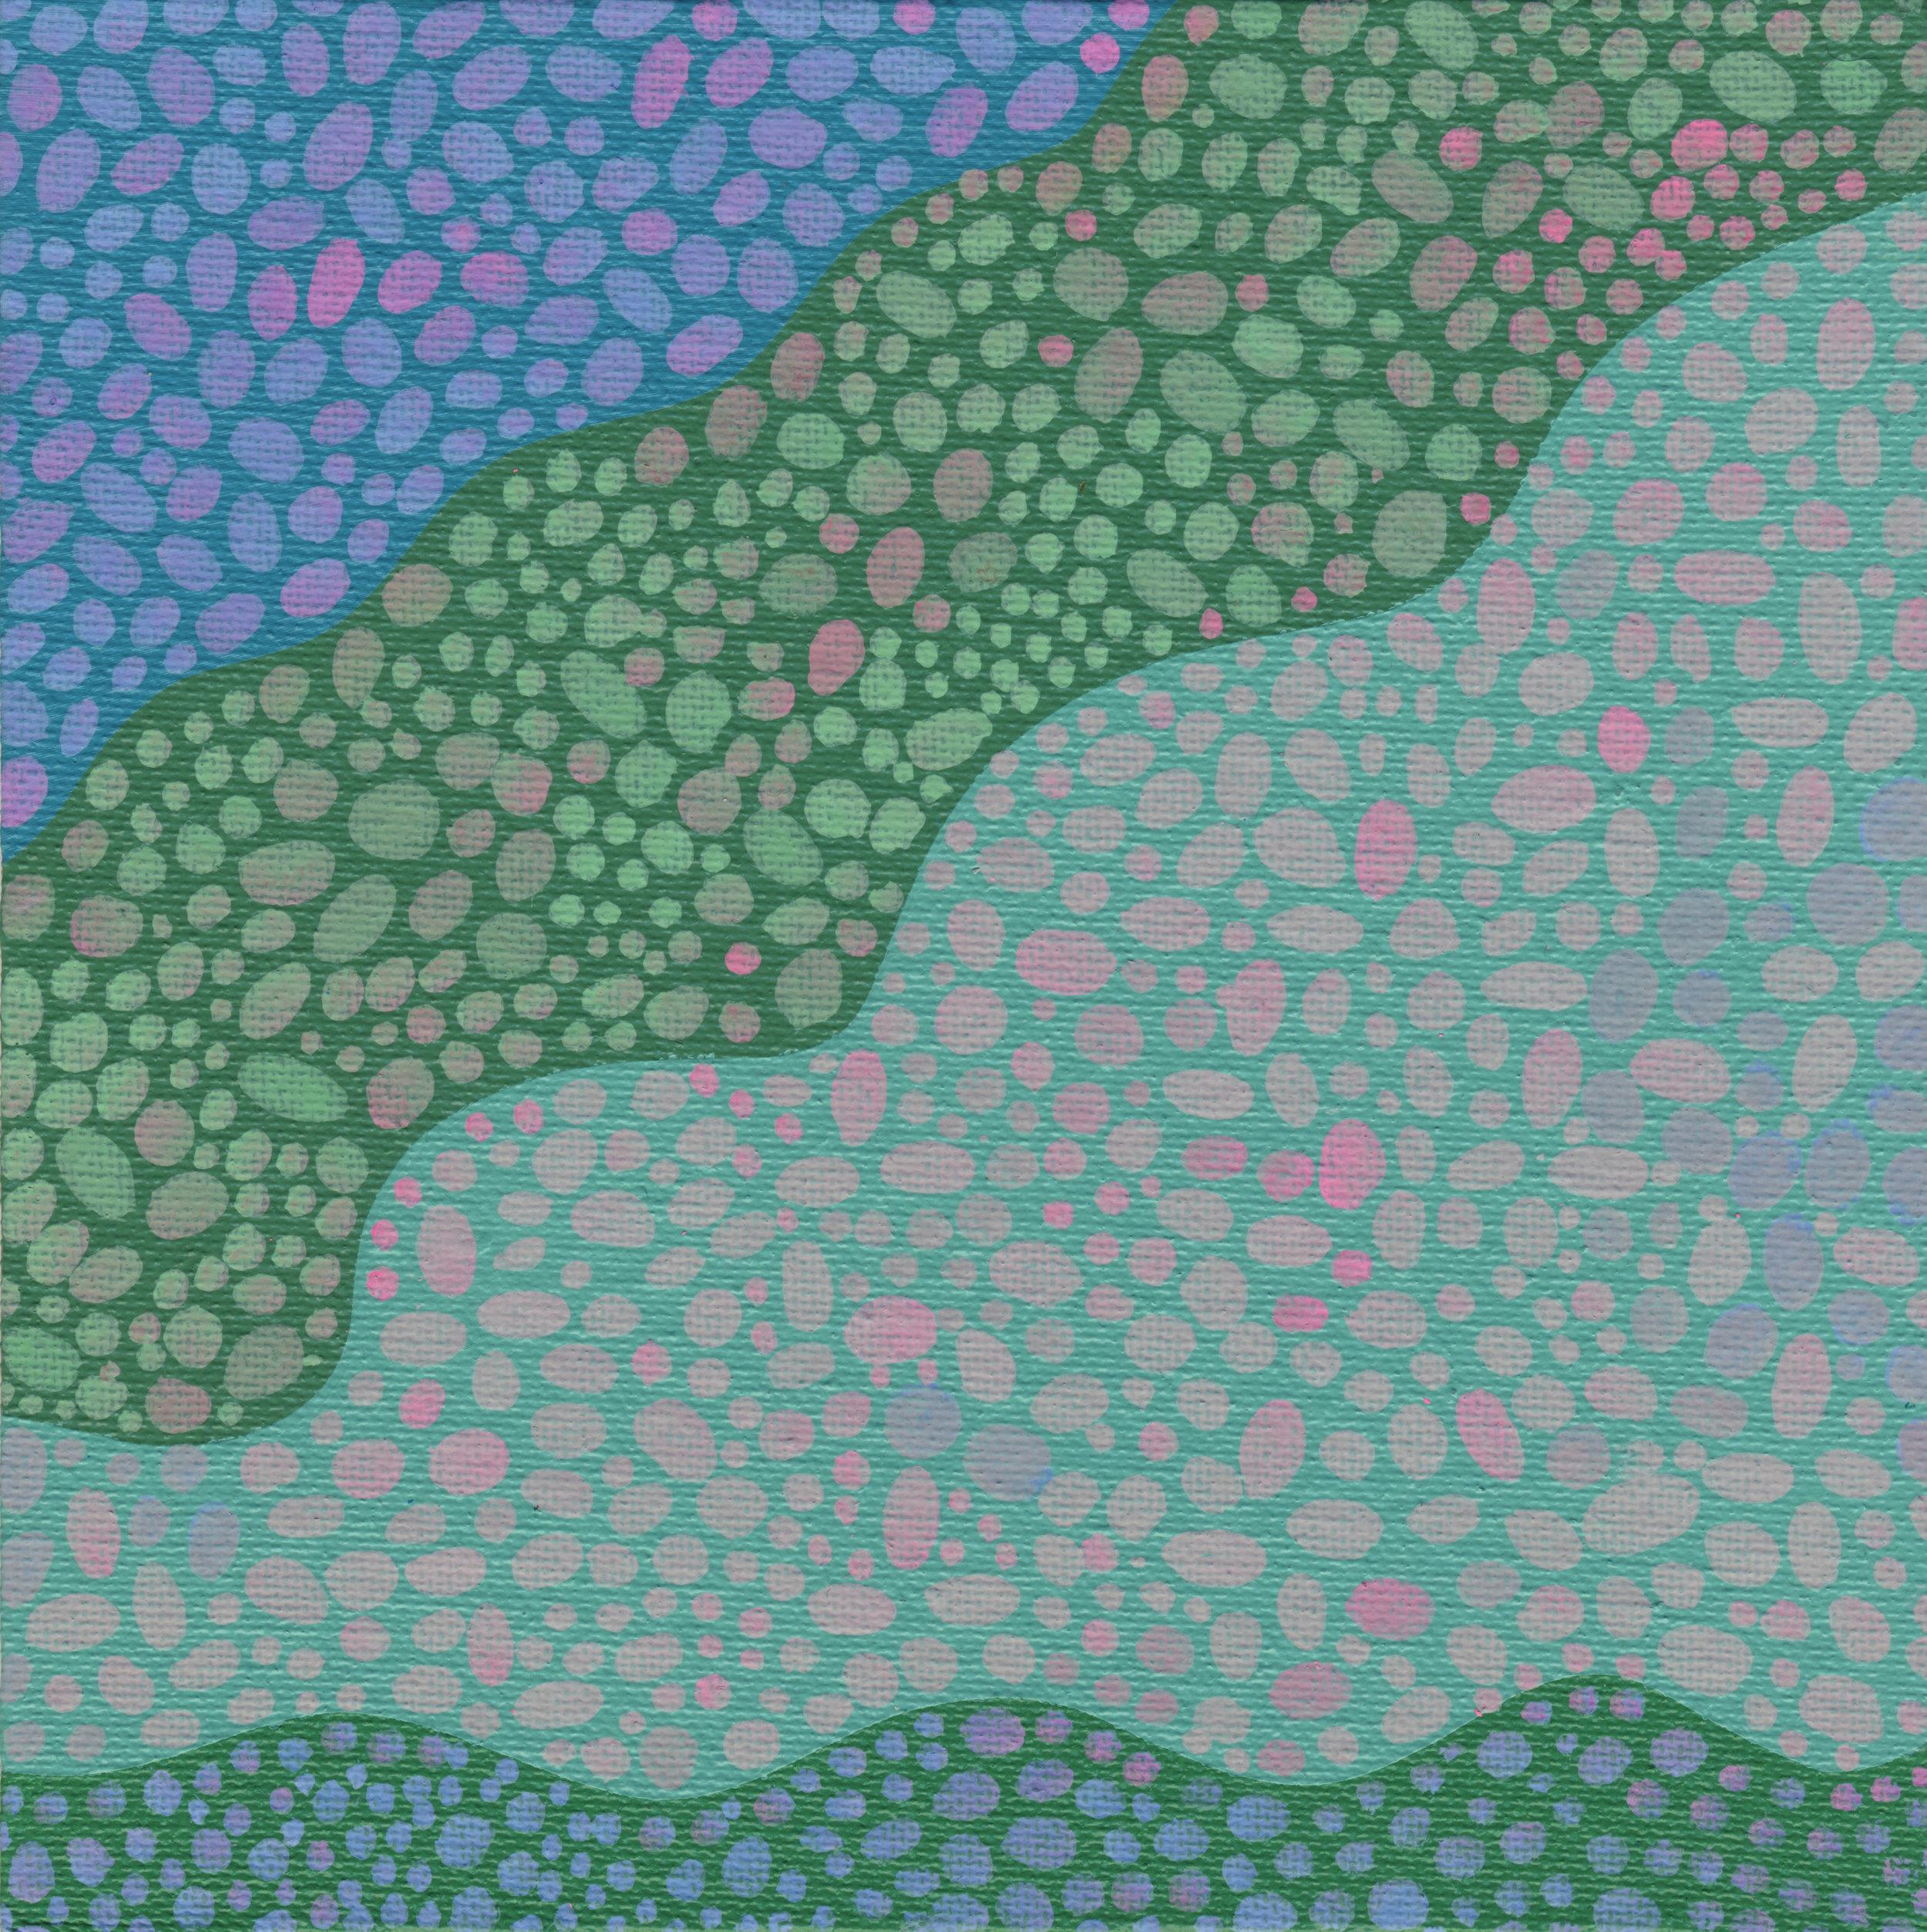 "90/100, Acrylic on canvas panel, 6"" X 6"", 4/6/19"